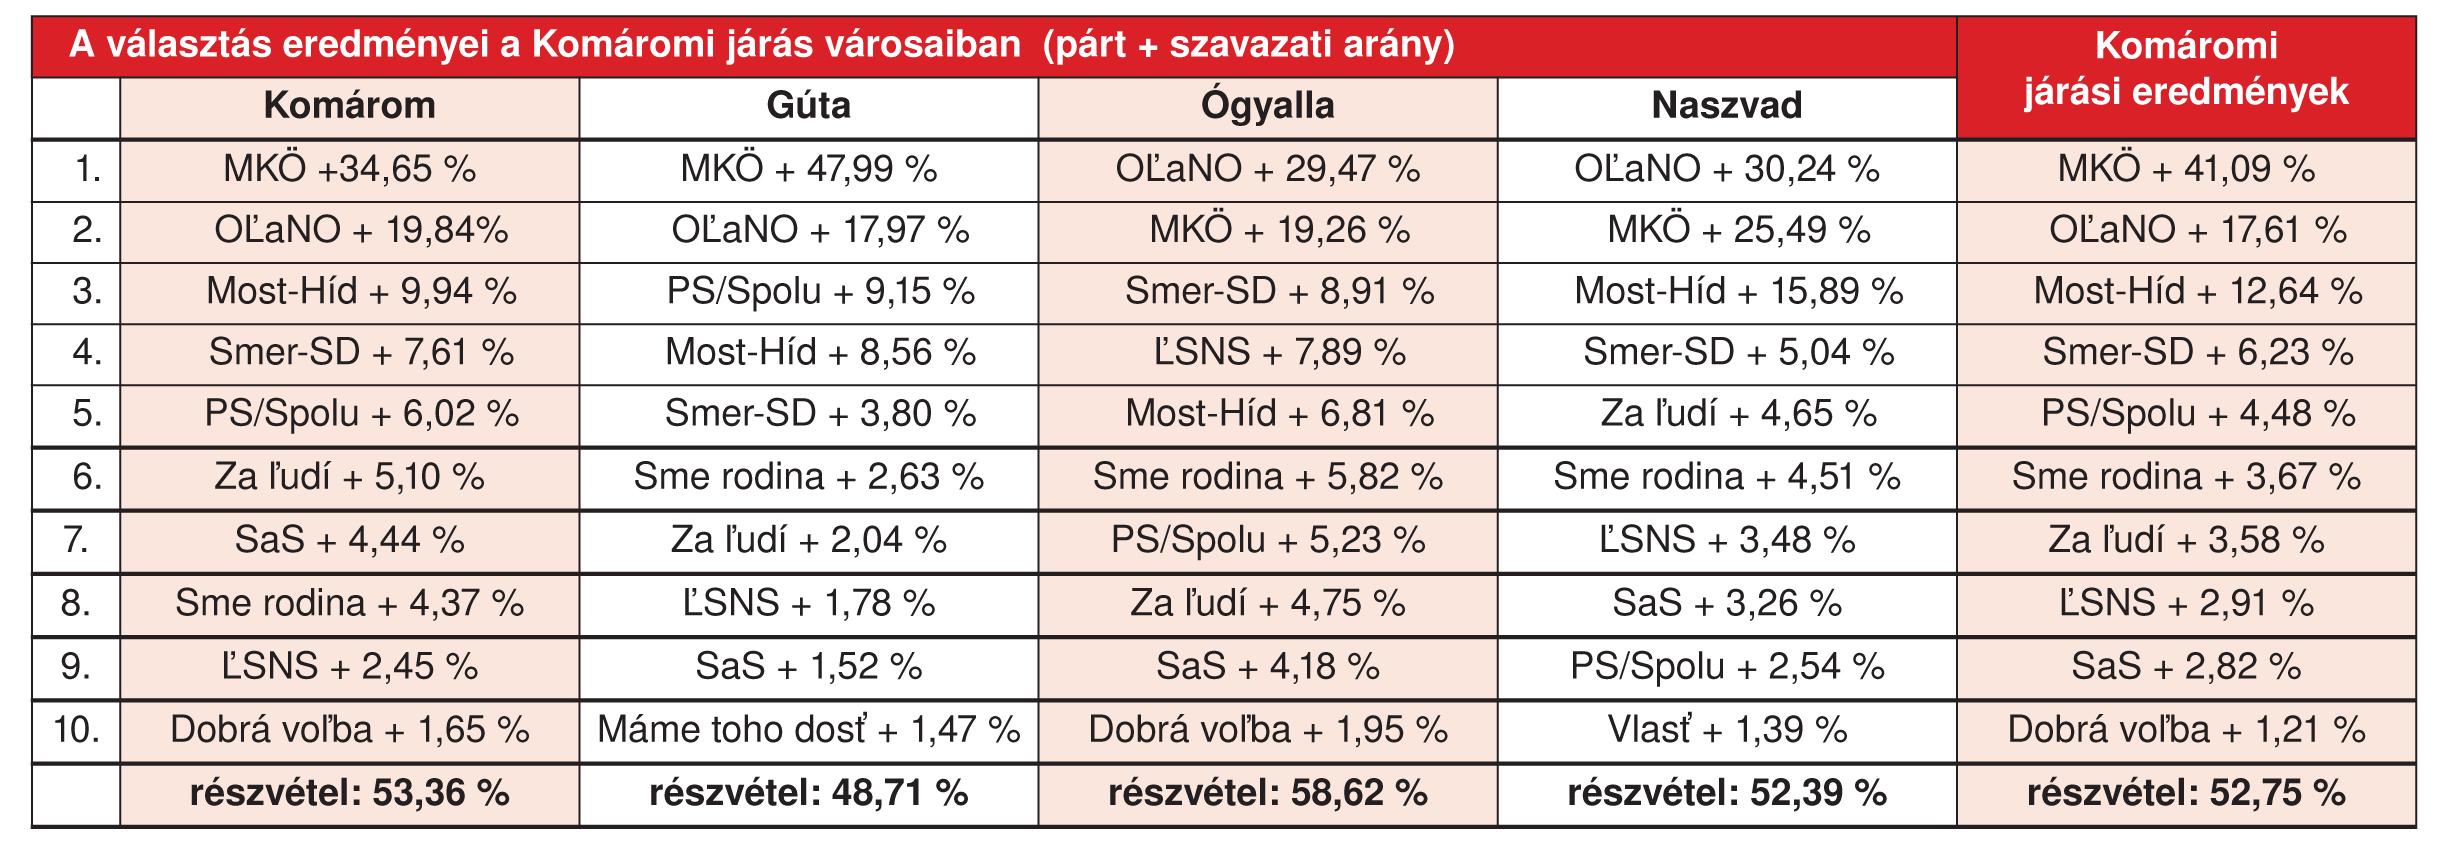 tablazat_varosok_kn